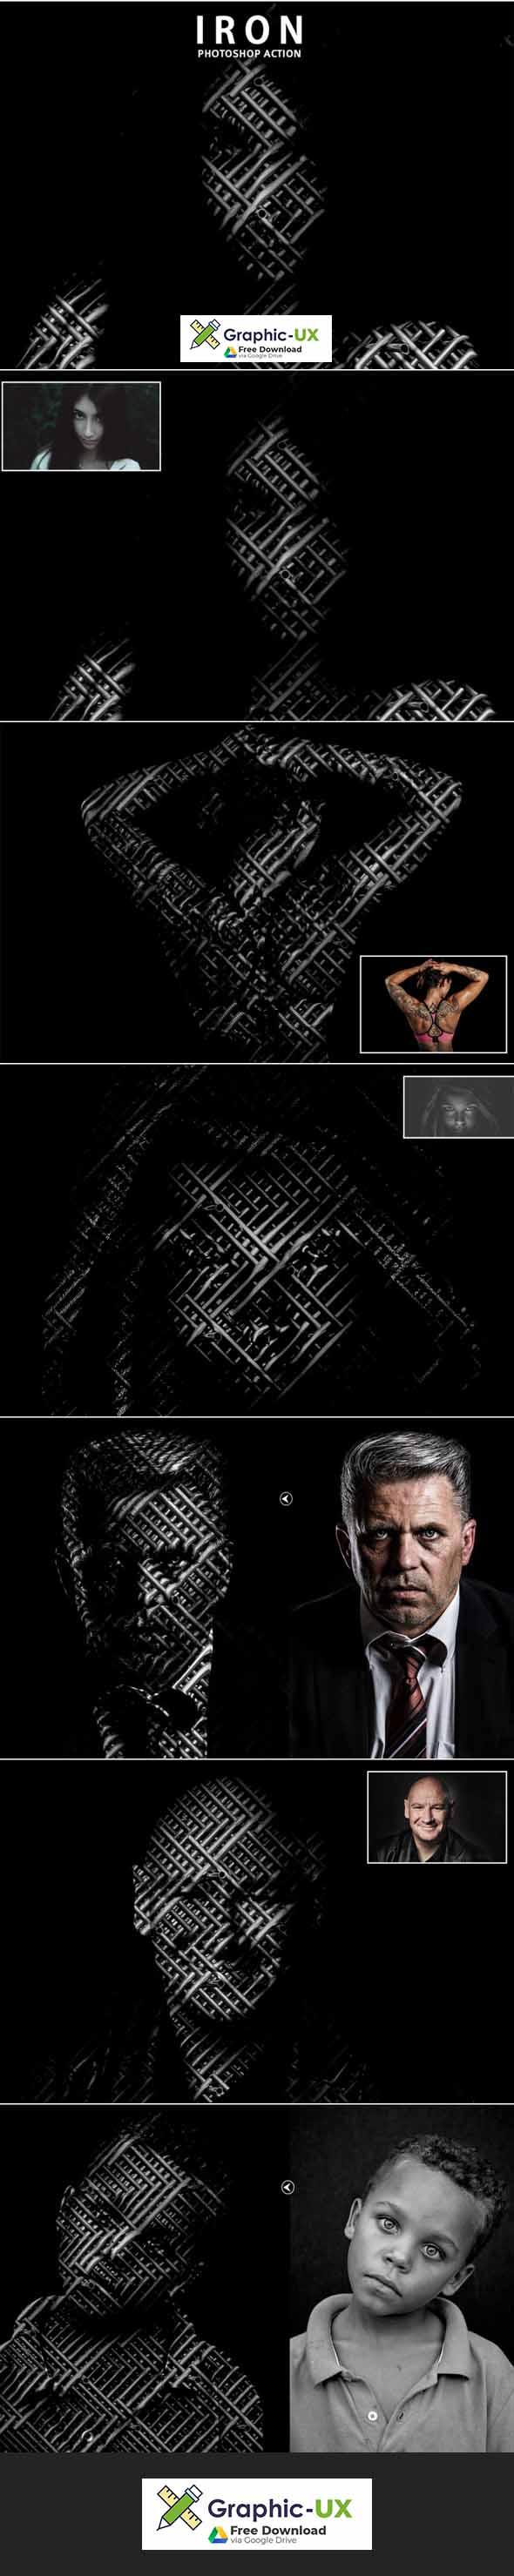 Iron Photoshop Actions